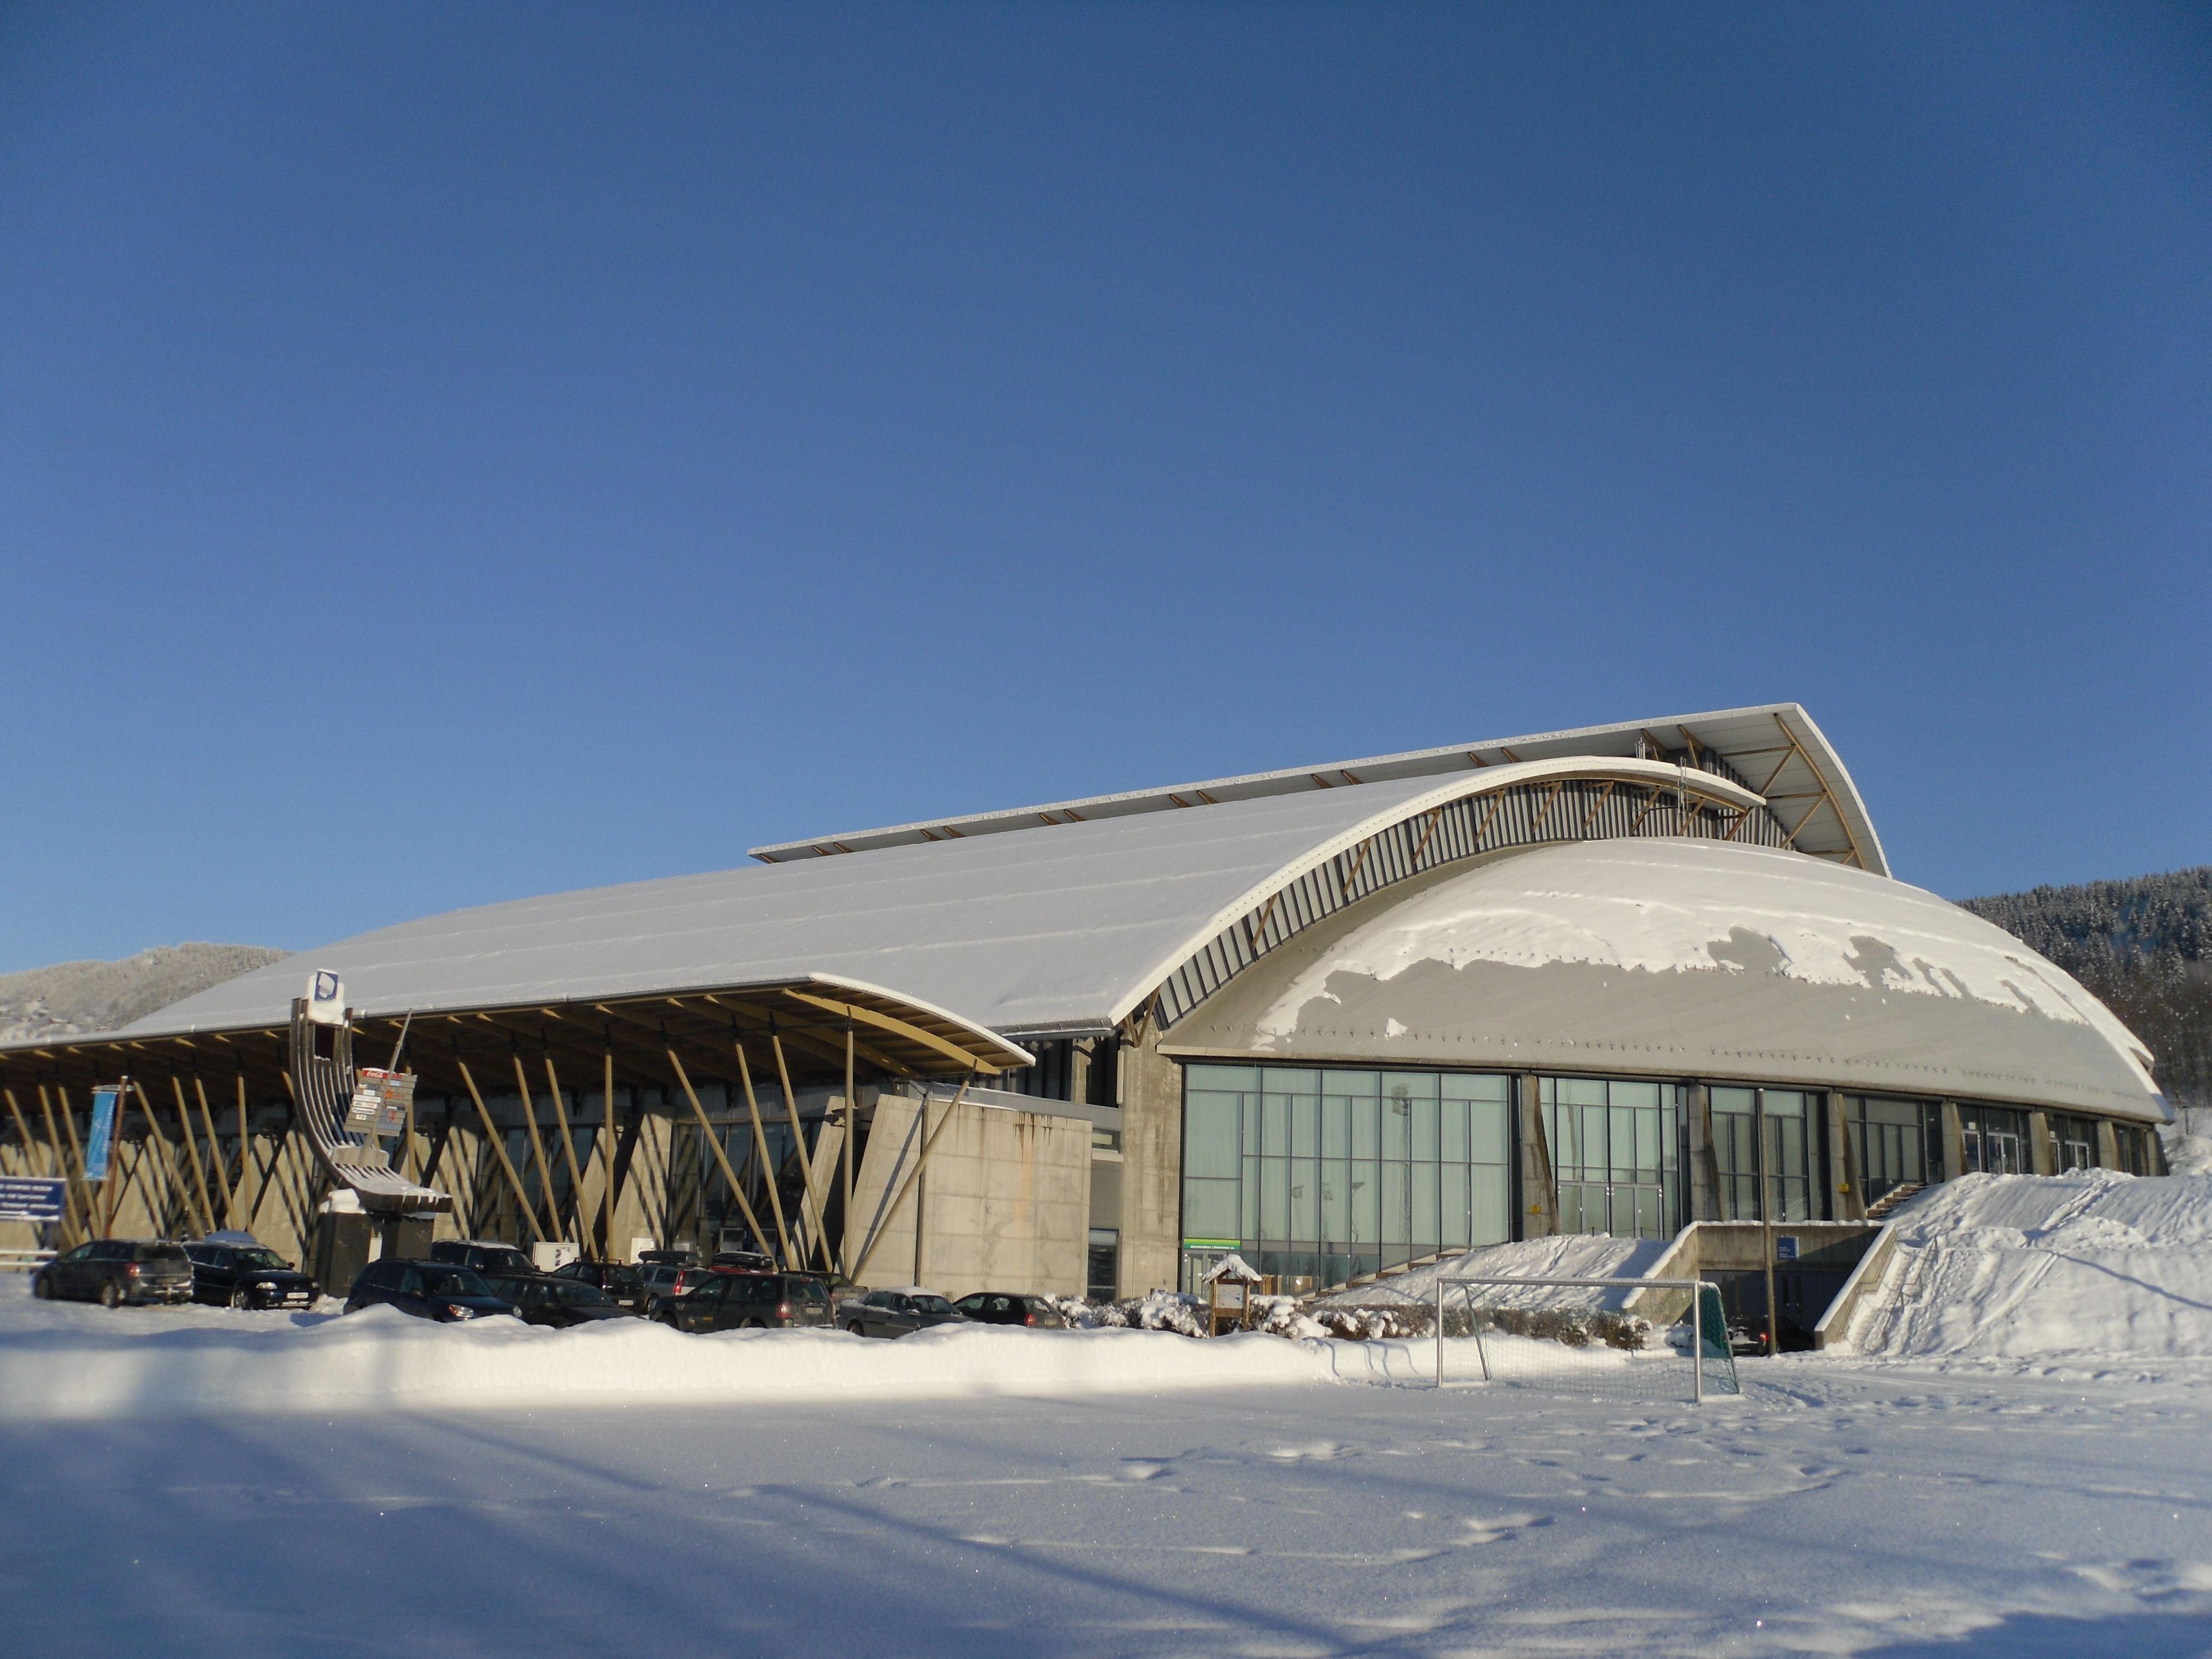 Håkons Hall